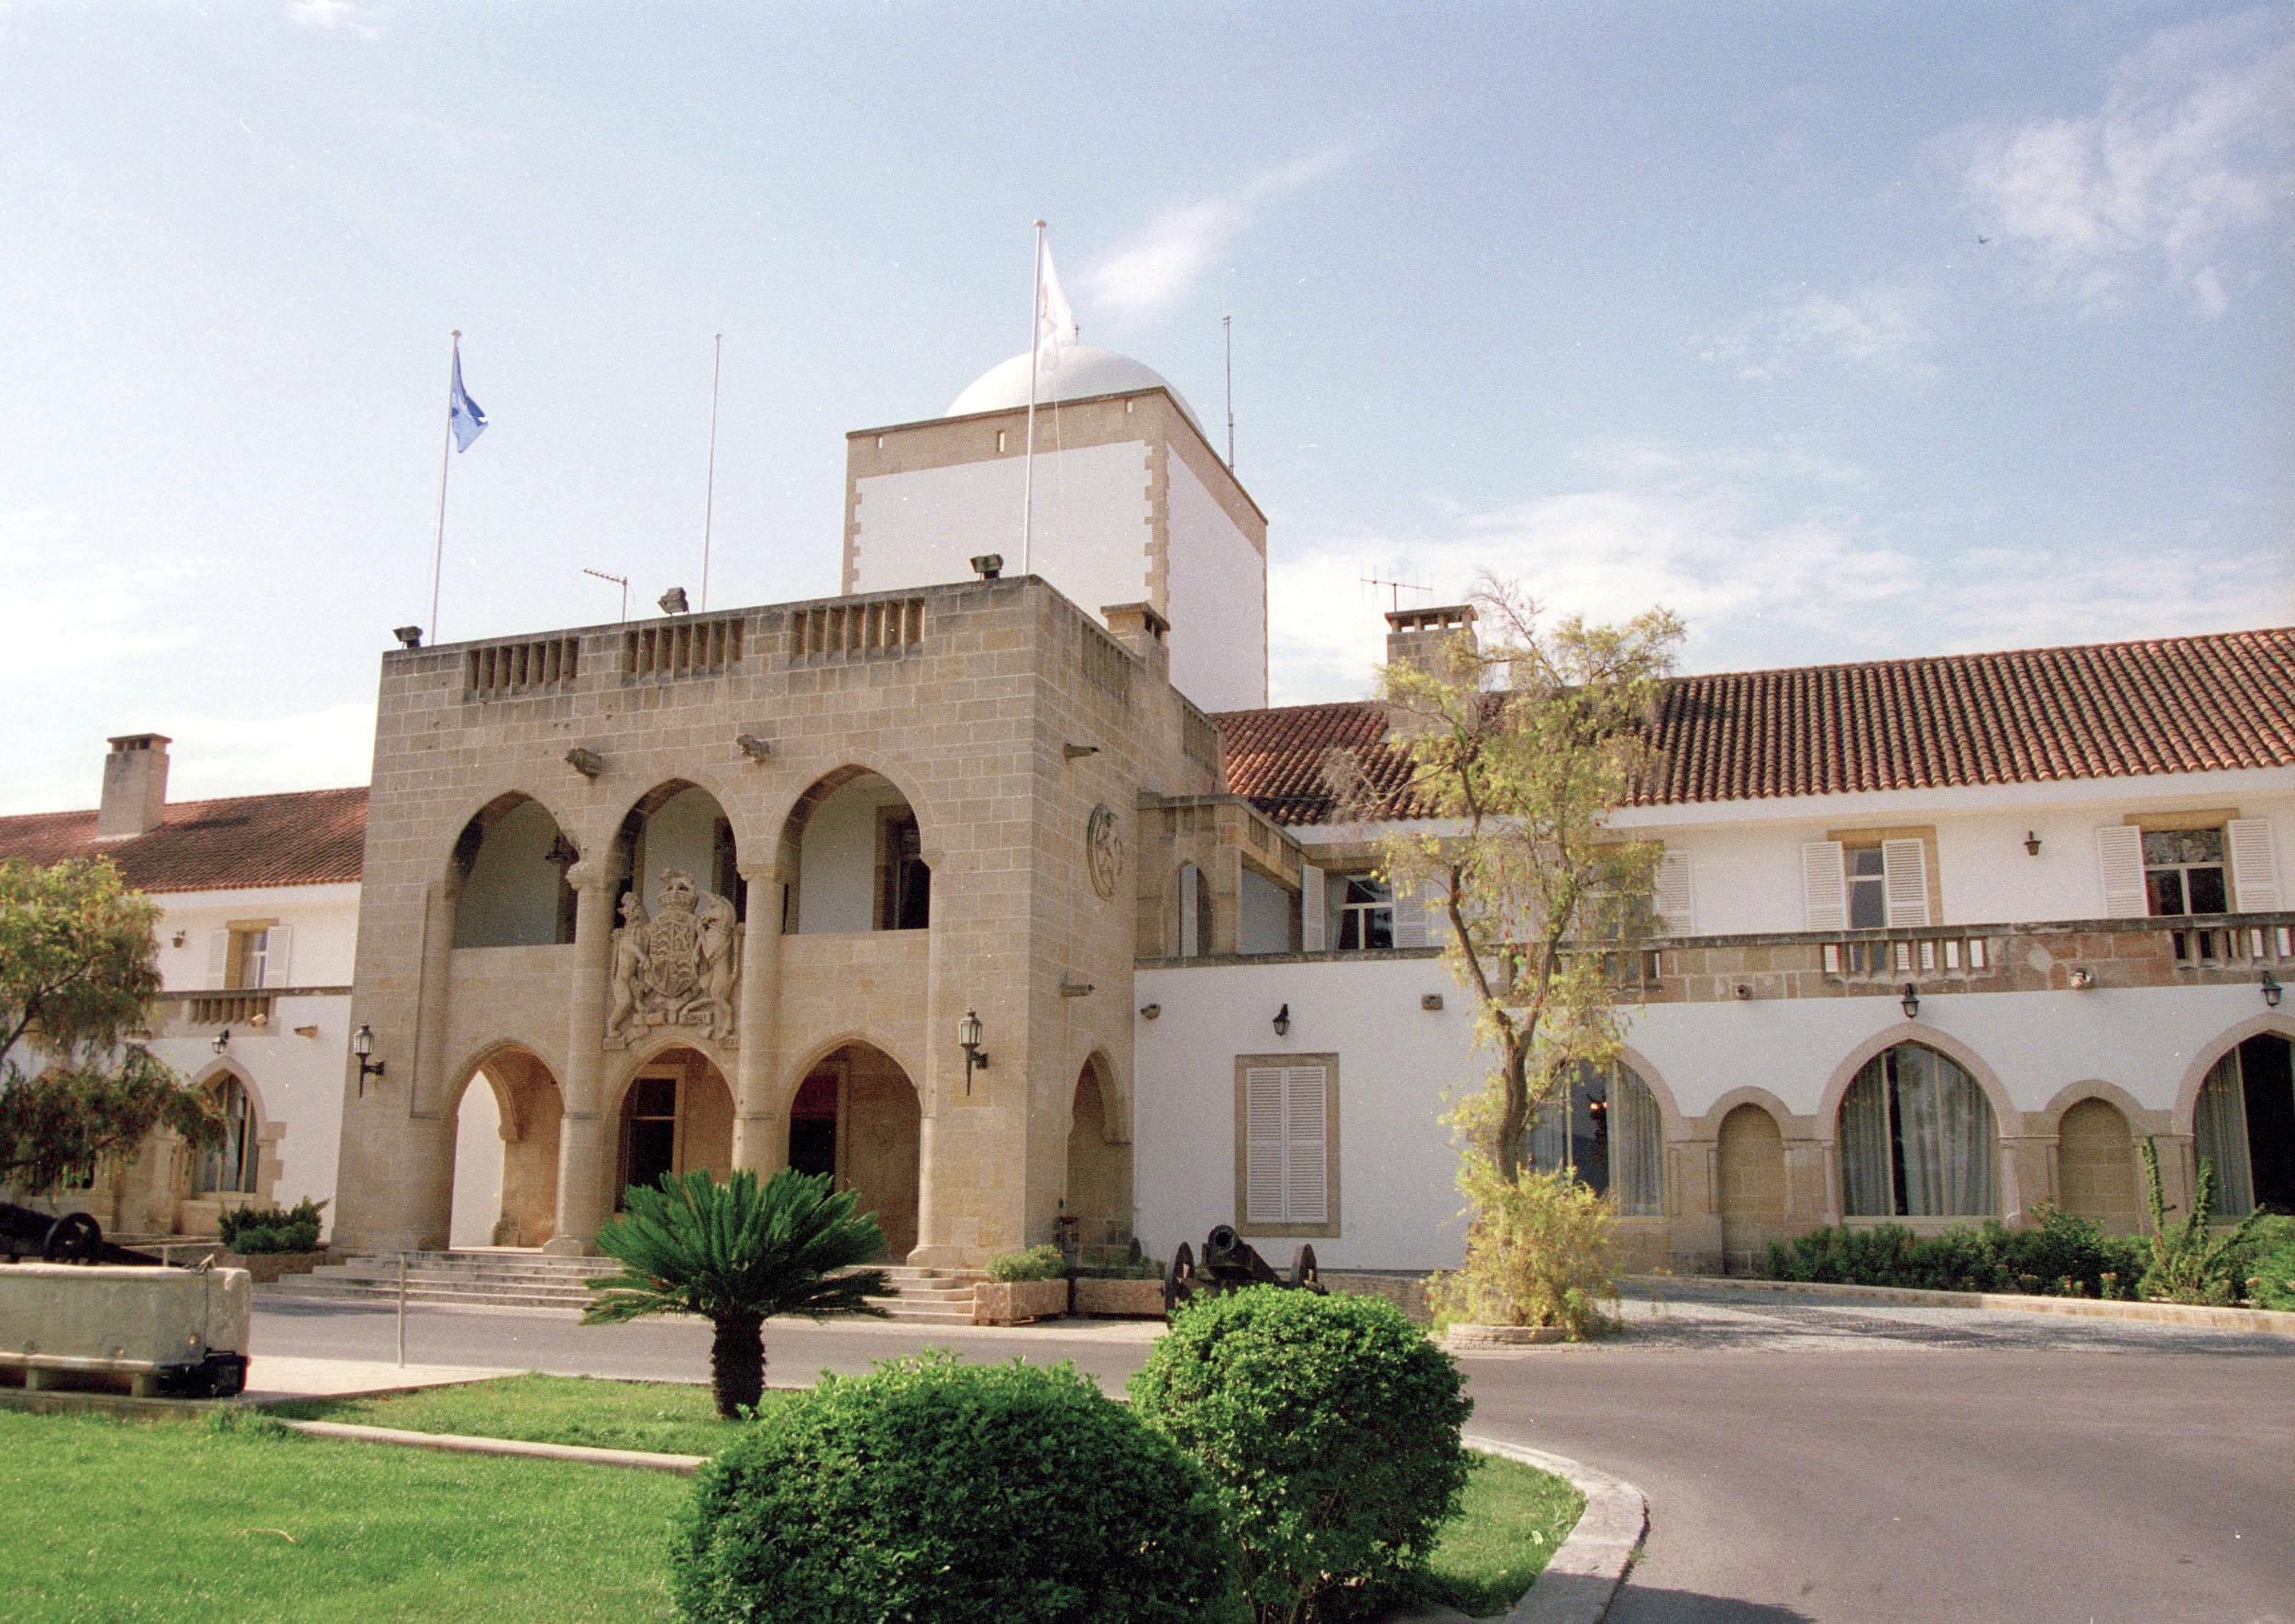 Cyprus: Government Spokesman shuts down lockdown and suspension of work rumors